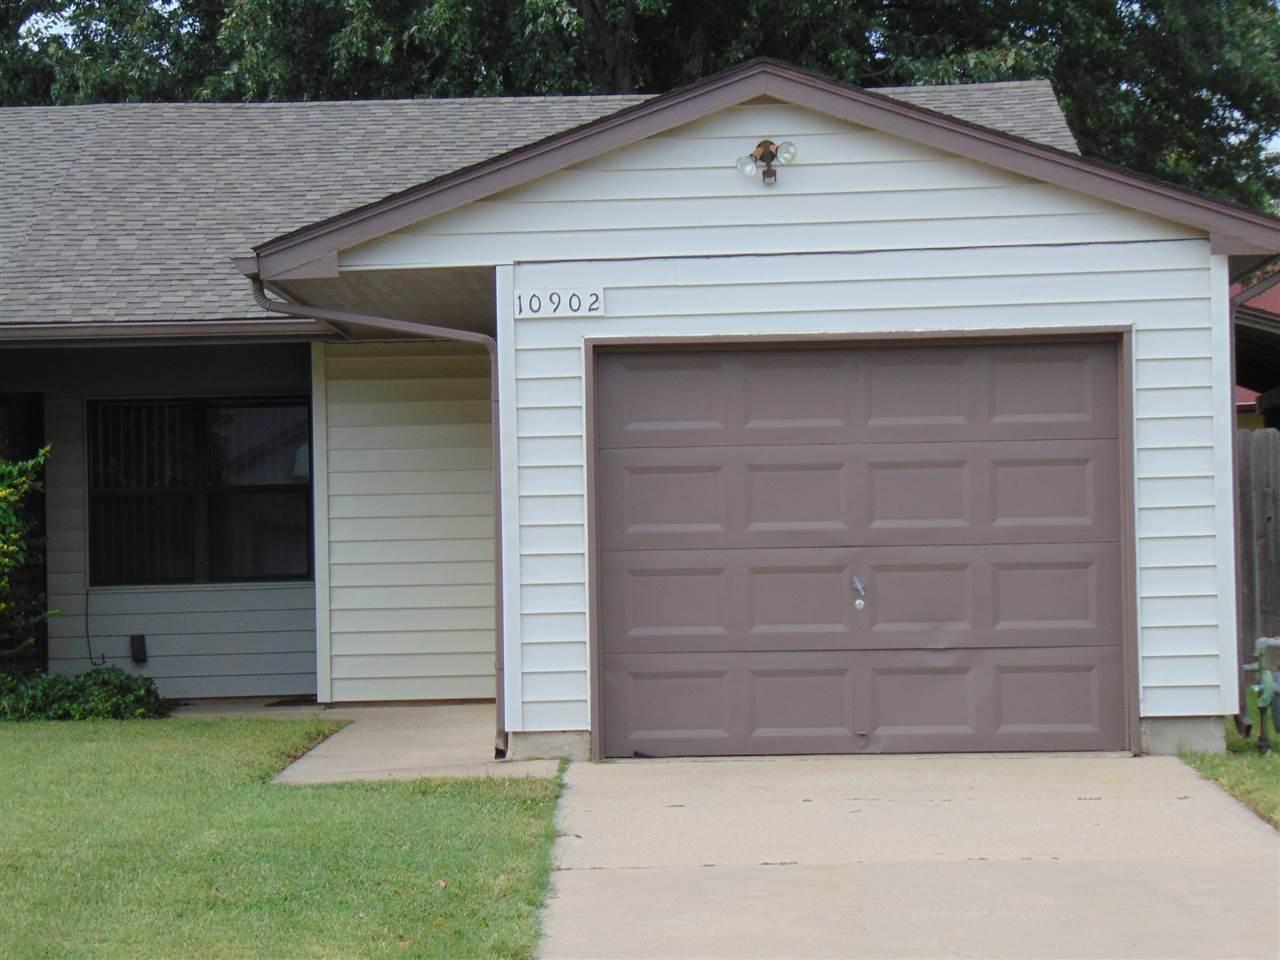 10902 W Grant St, Wichita, KS 67209